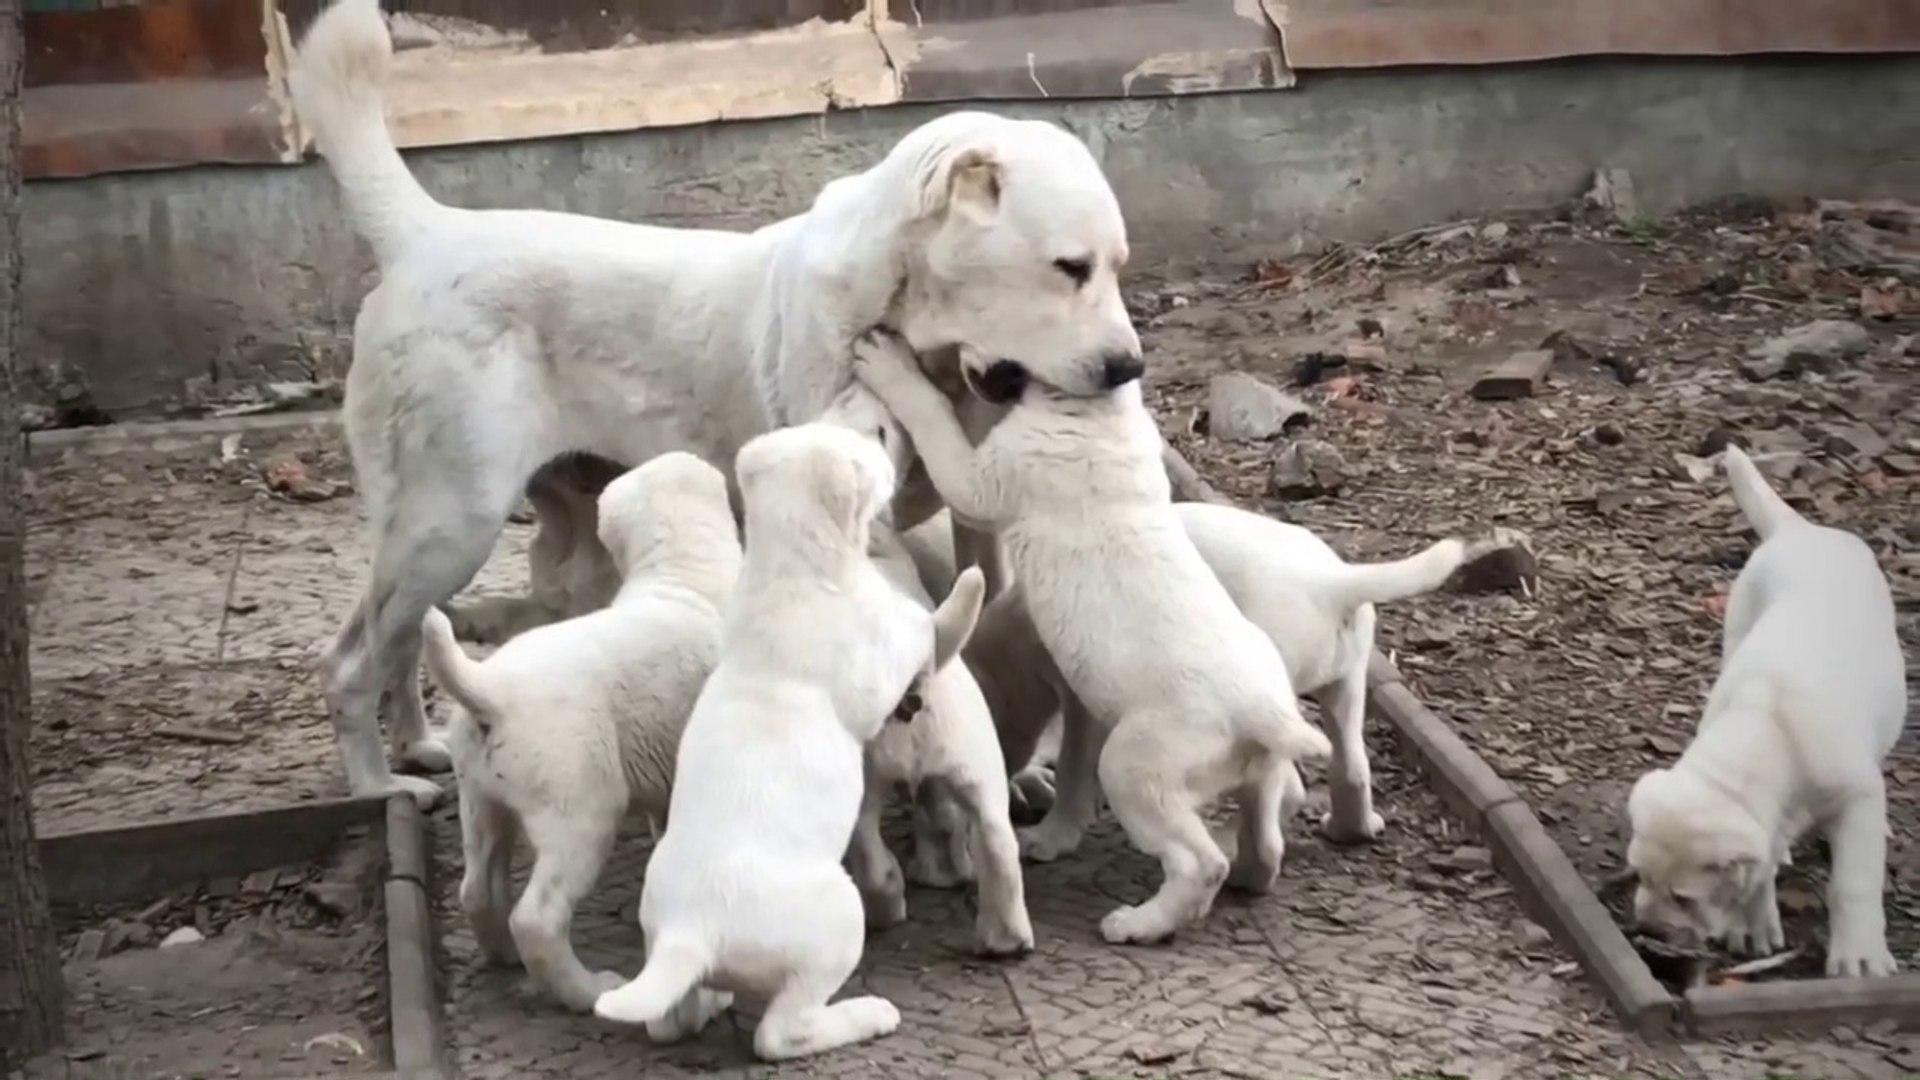 ALABAYLAR ve YAVRU KOPEKLER - ALABAi SHEPHERD DOG and ALABAi PUPPiES